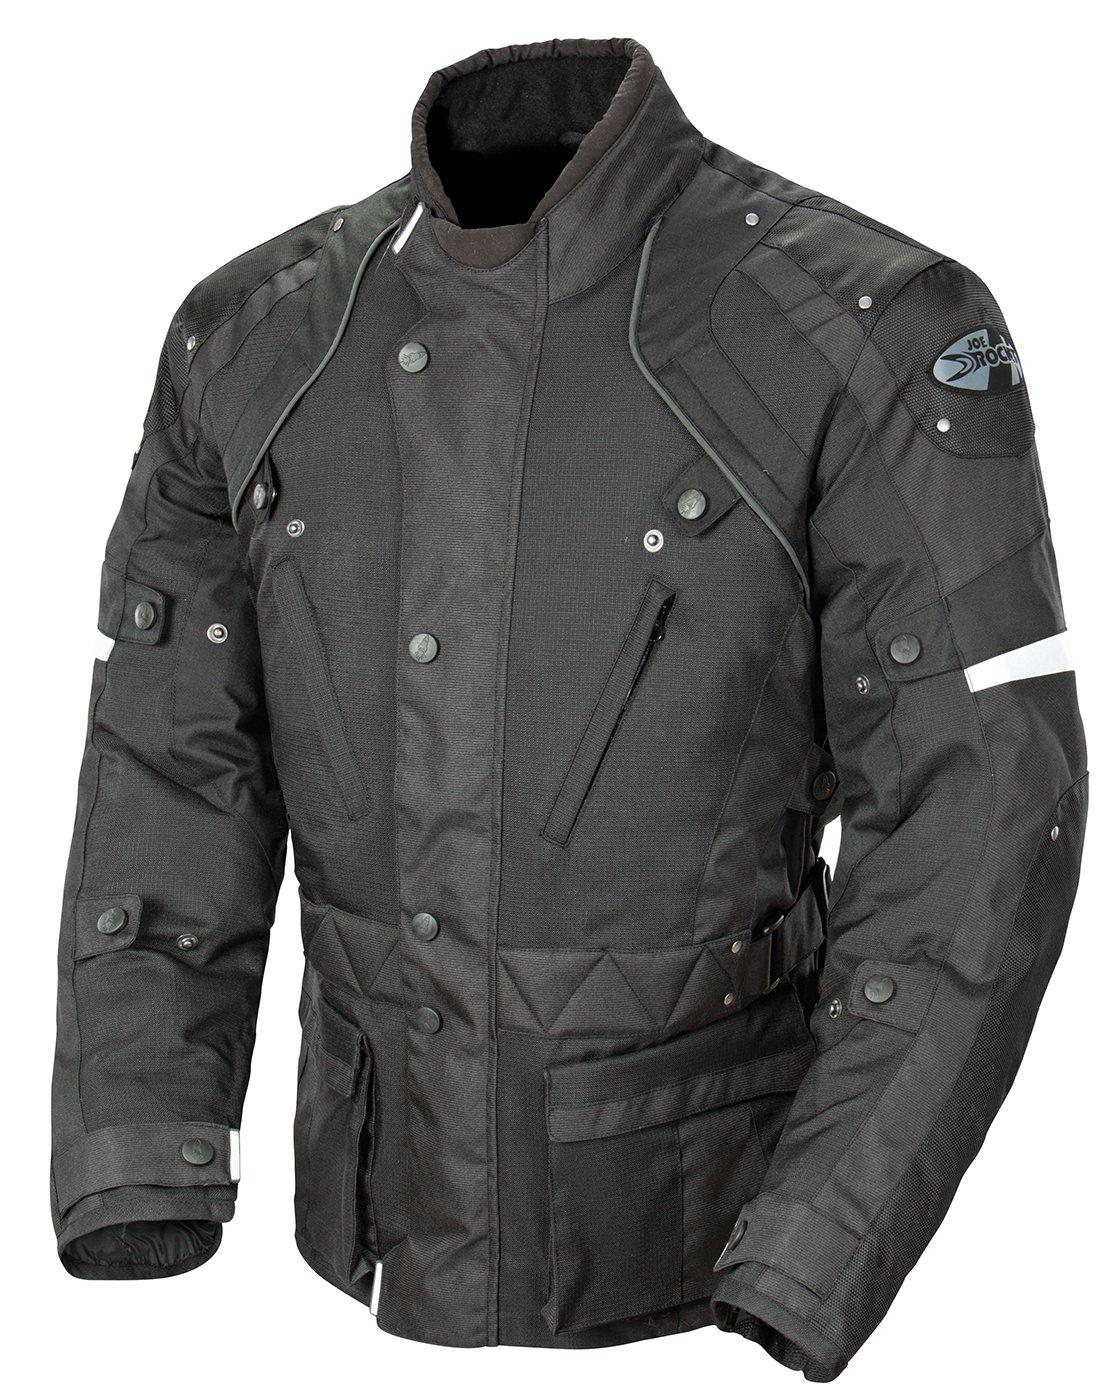 Blue//Black//Small Joe Rocket Velocity 2.0 Mens Textile Street Motorcycle Gloves